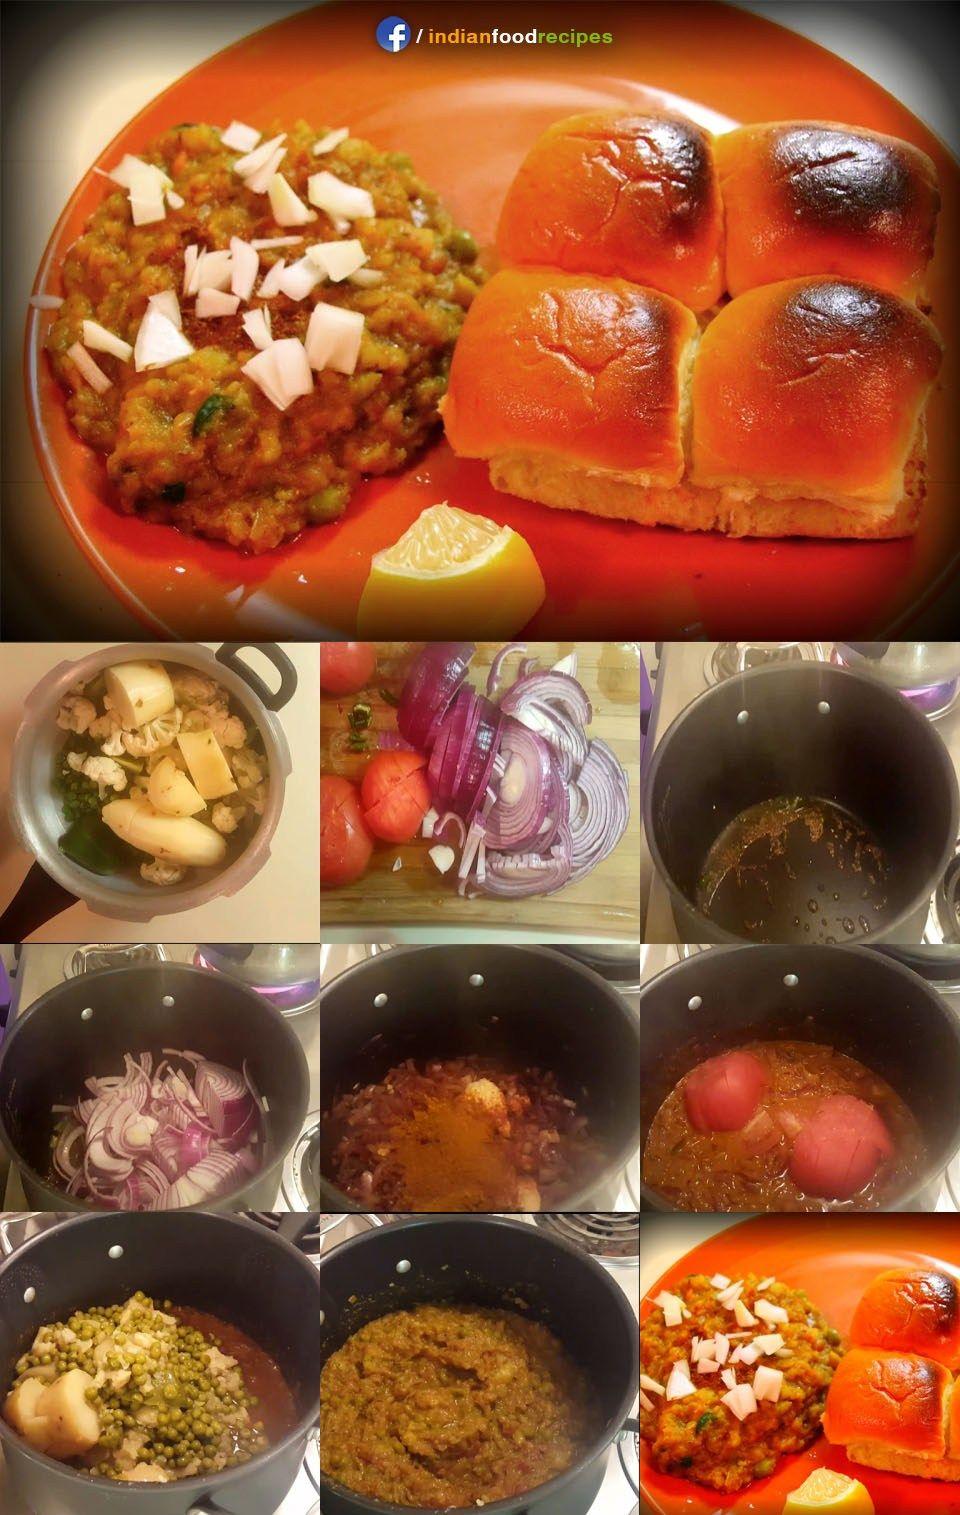 Healthy pav bhaji recipe step by step pav bhaji is an indian dish healthy pav bhaji recipe step by step pav bhaji is an indian dish made with forumfinder Images